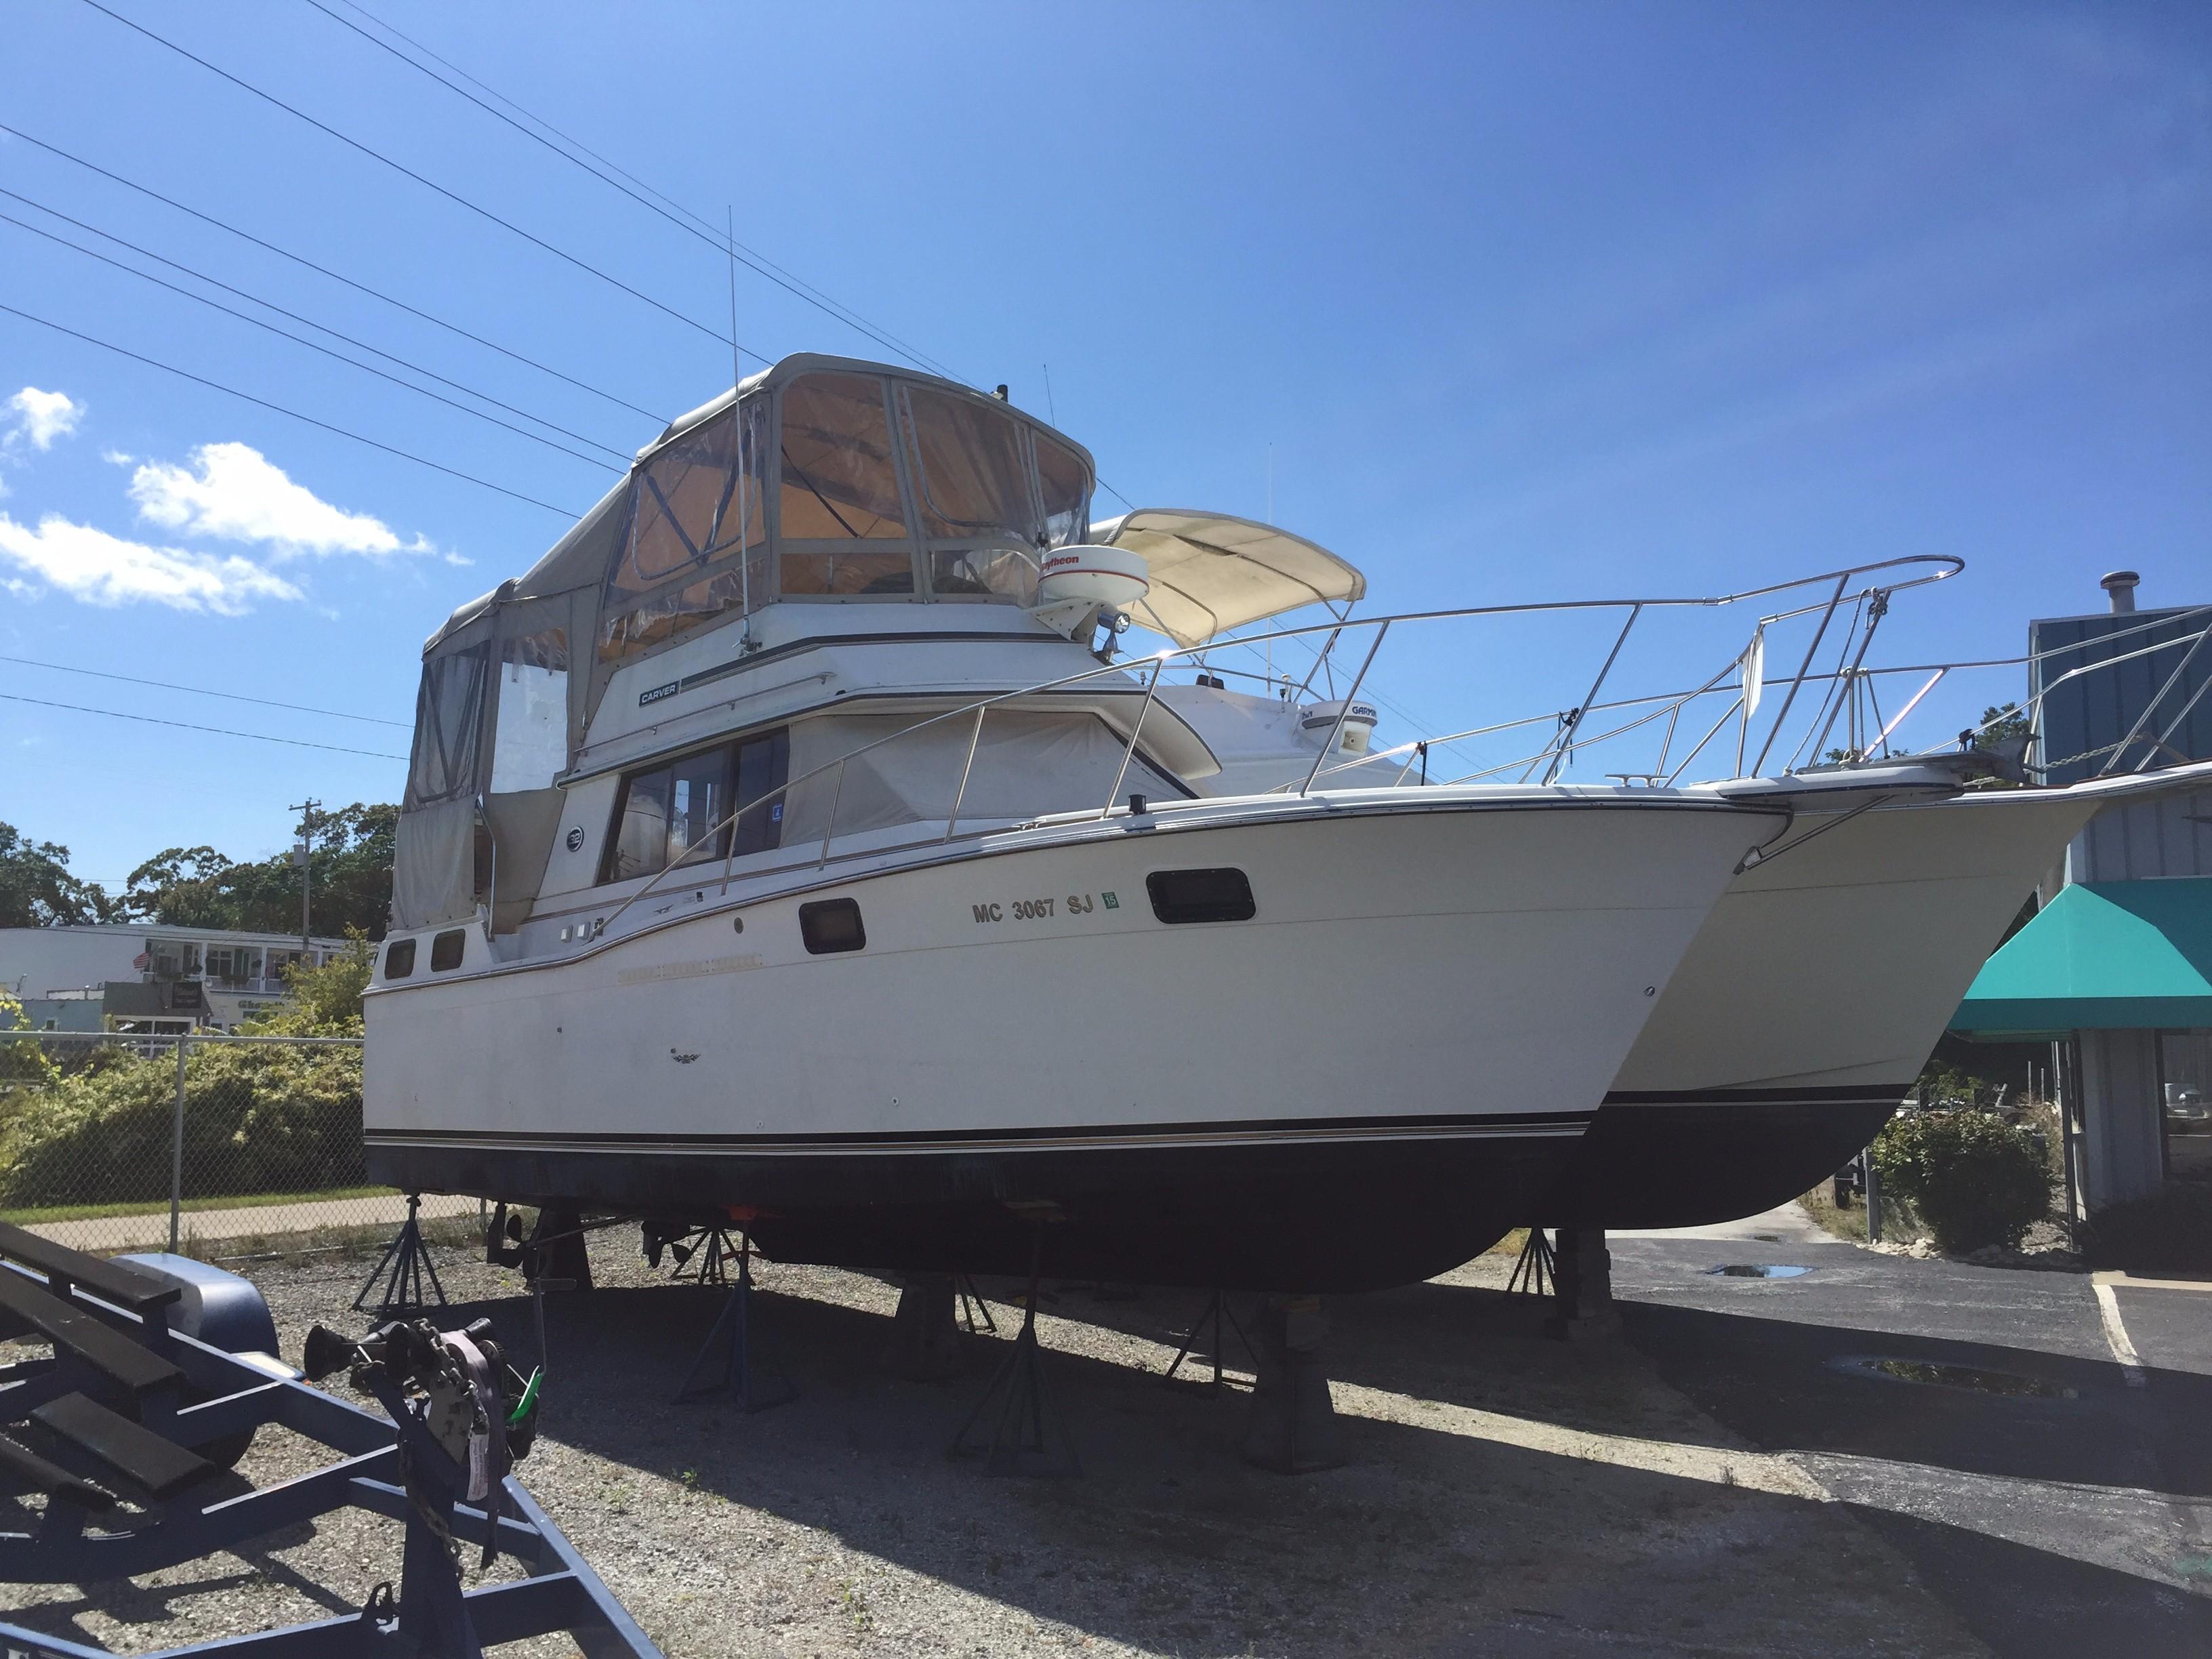 1989 Carver 3207 Aft Cabin Power Boat For Sale Www